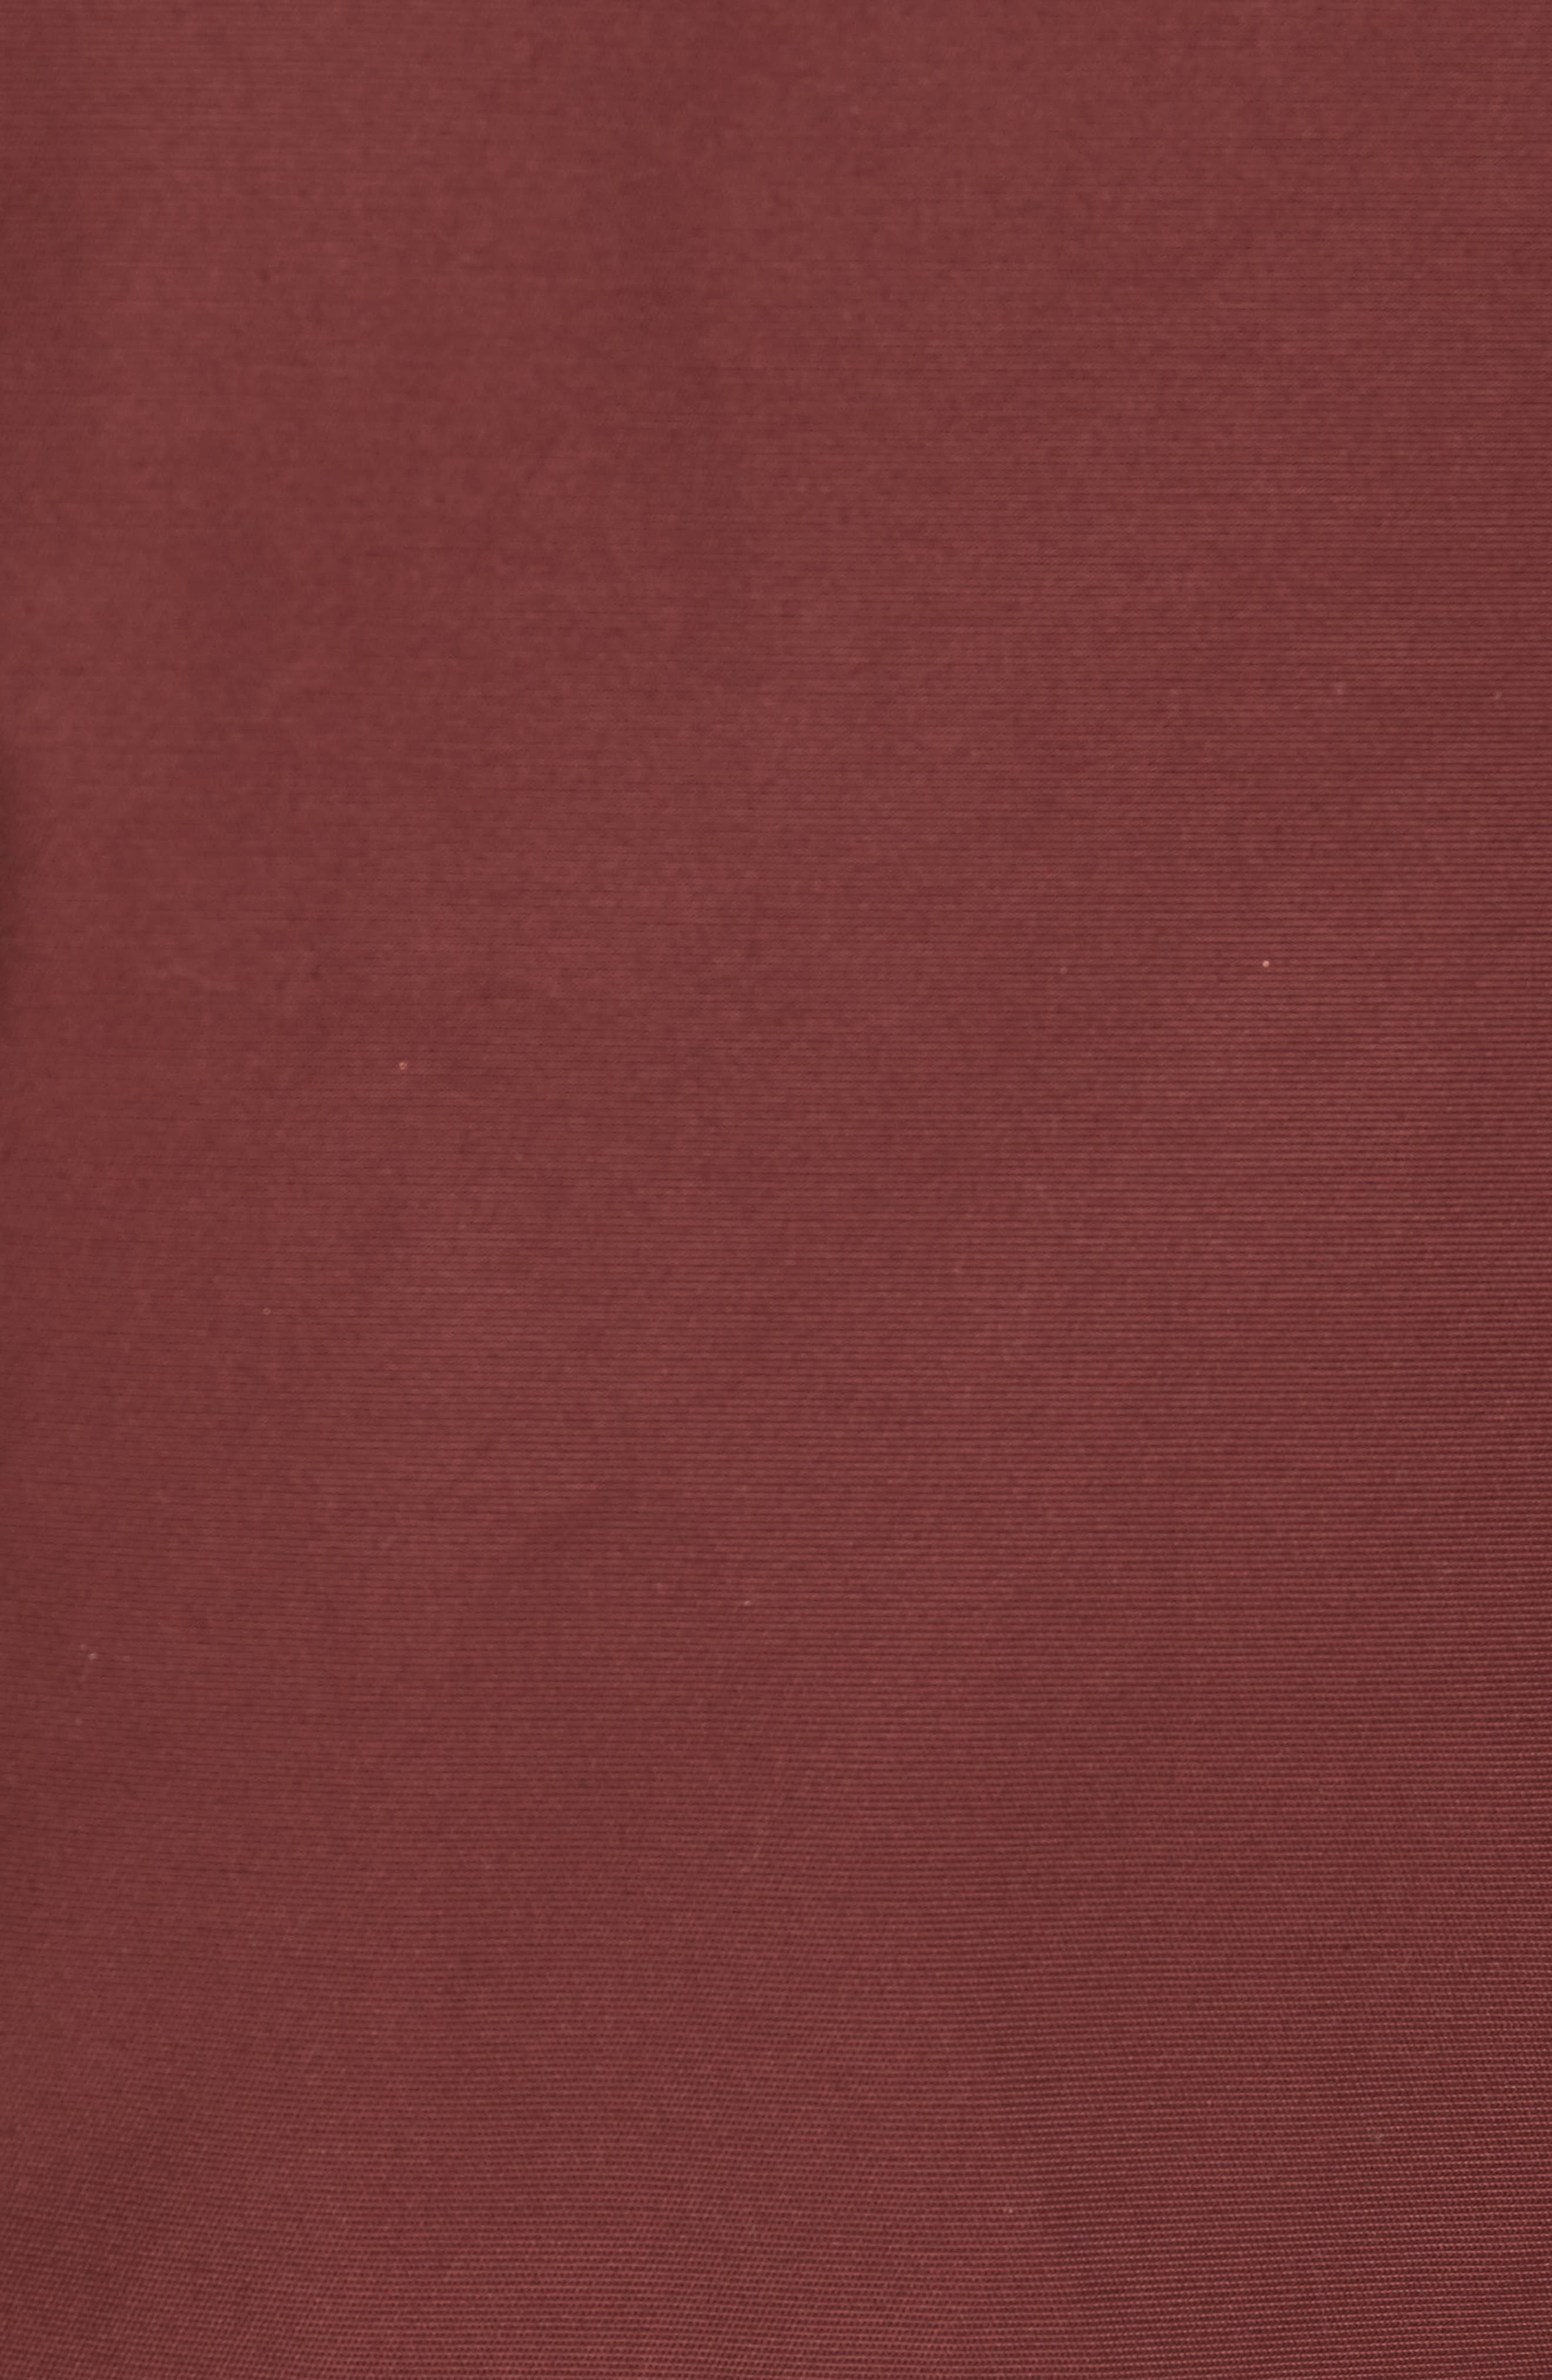 'Ballistic' Bomber Jacket with Genuine Fox Fur Trim,                             Alternate thumbnail 5, color,                             Muskoka